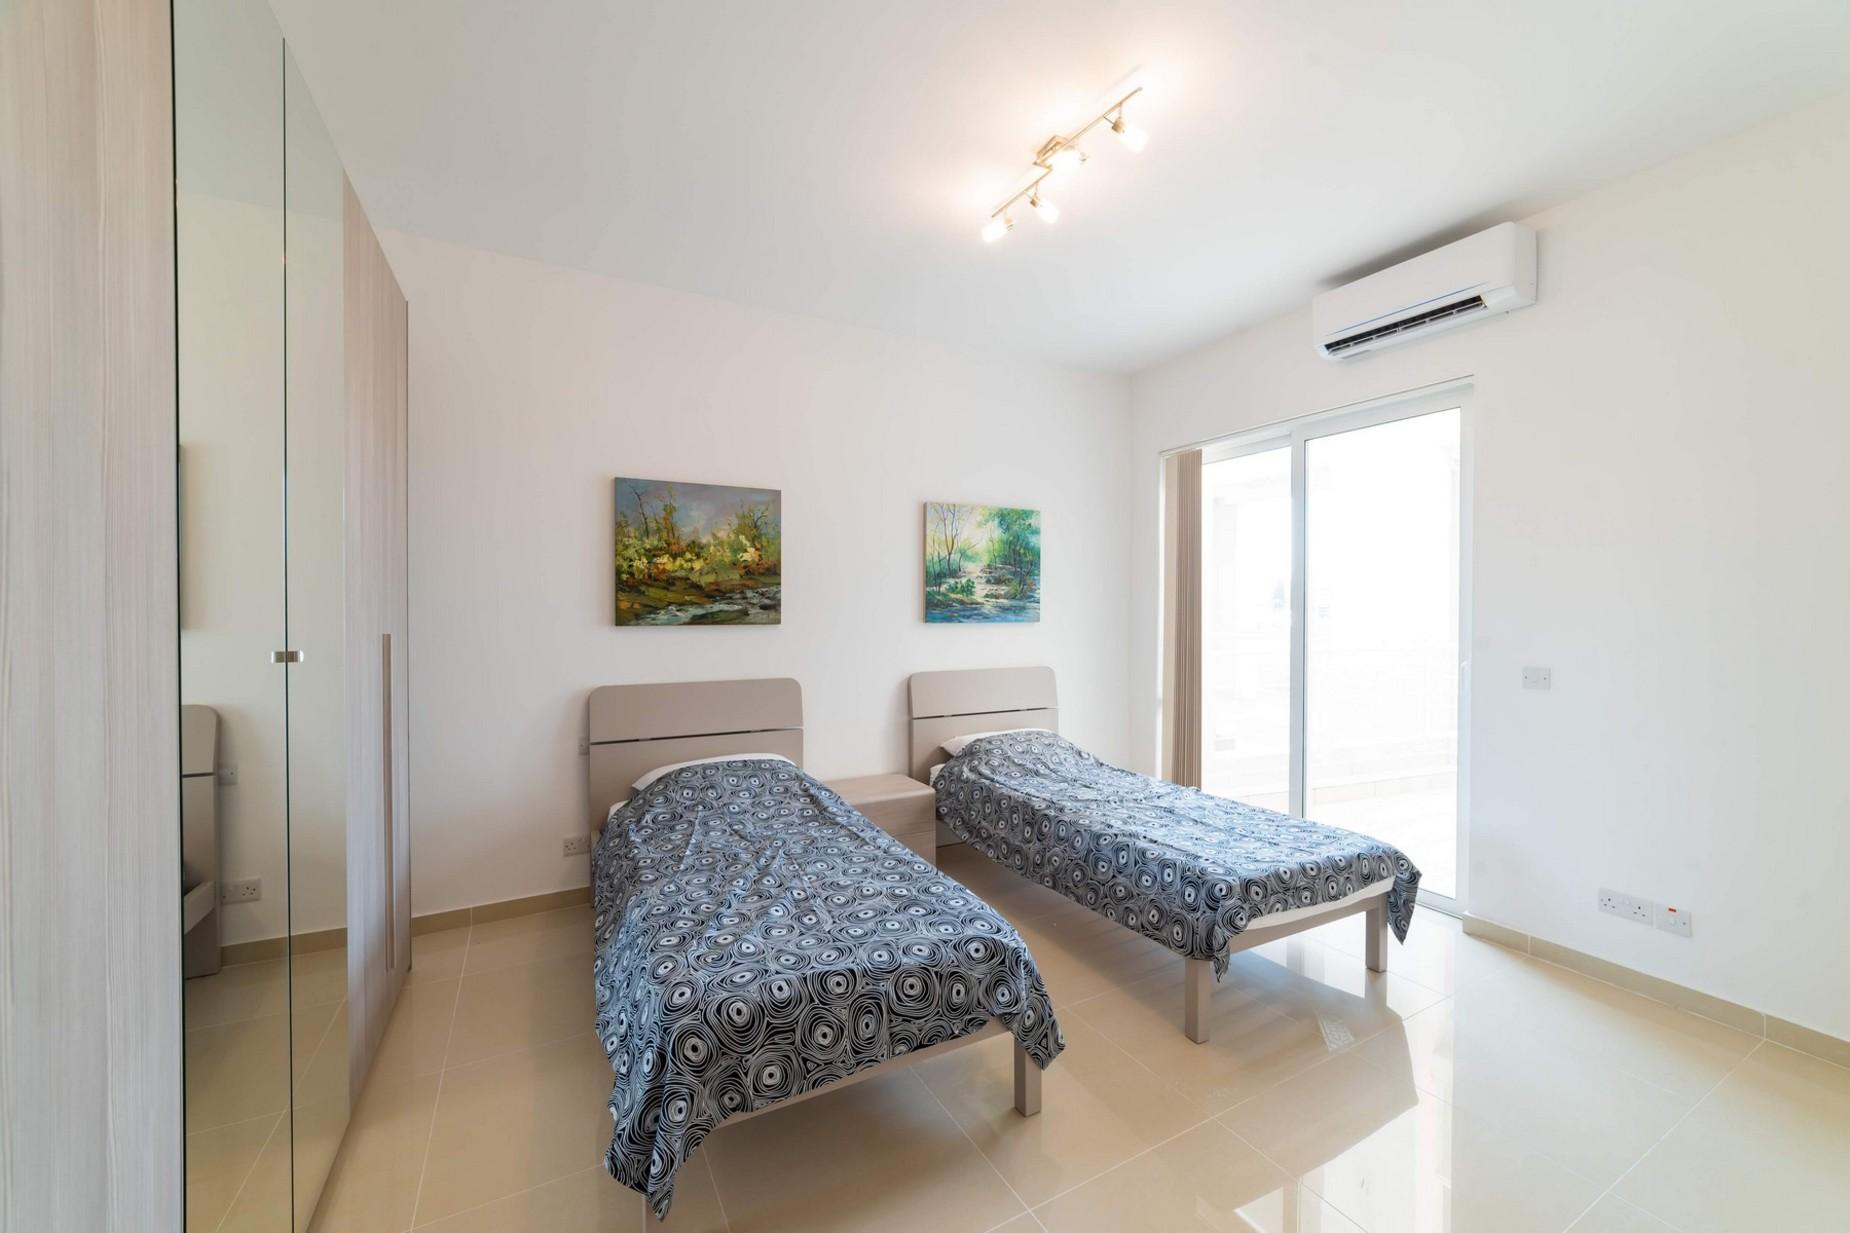 3 bed Apartment For Rent in Balzan, Balzan - thumb 10